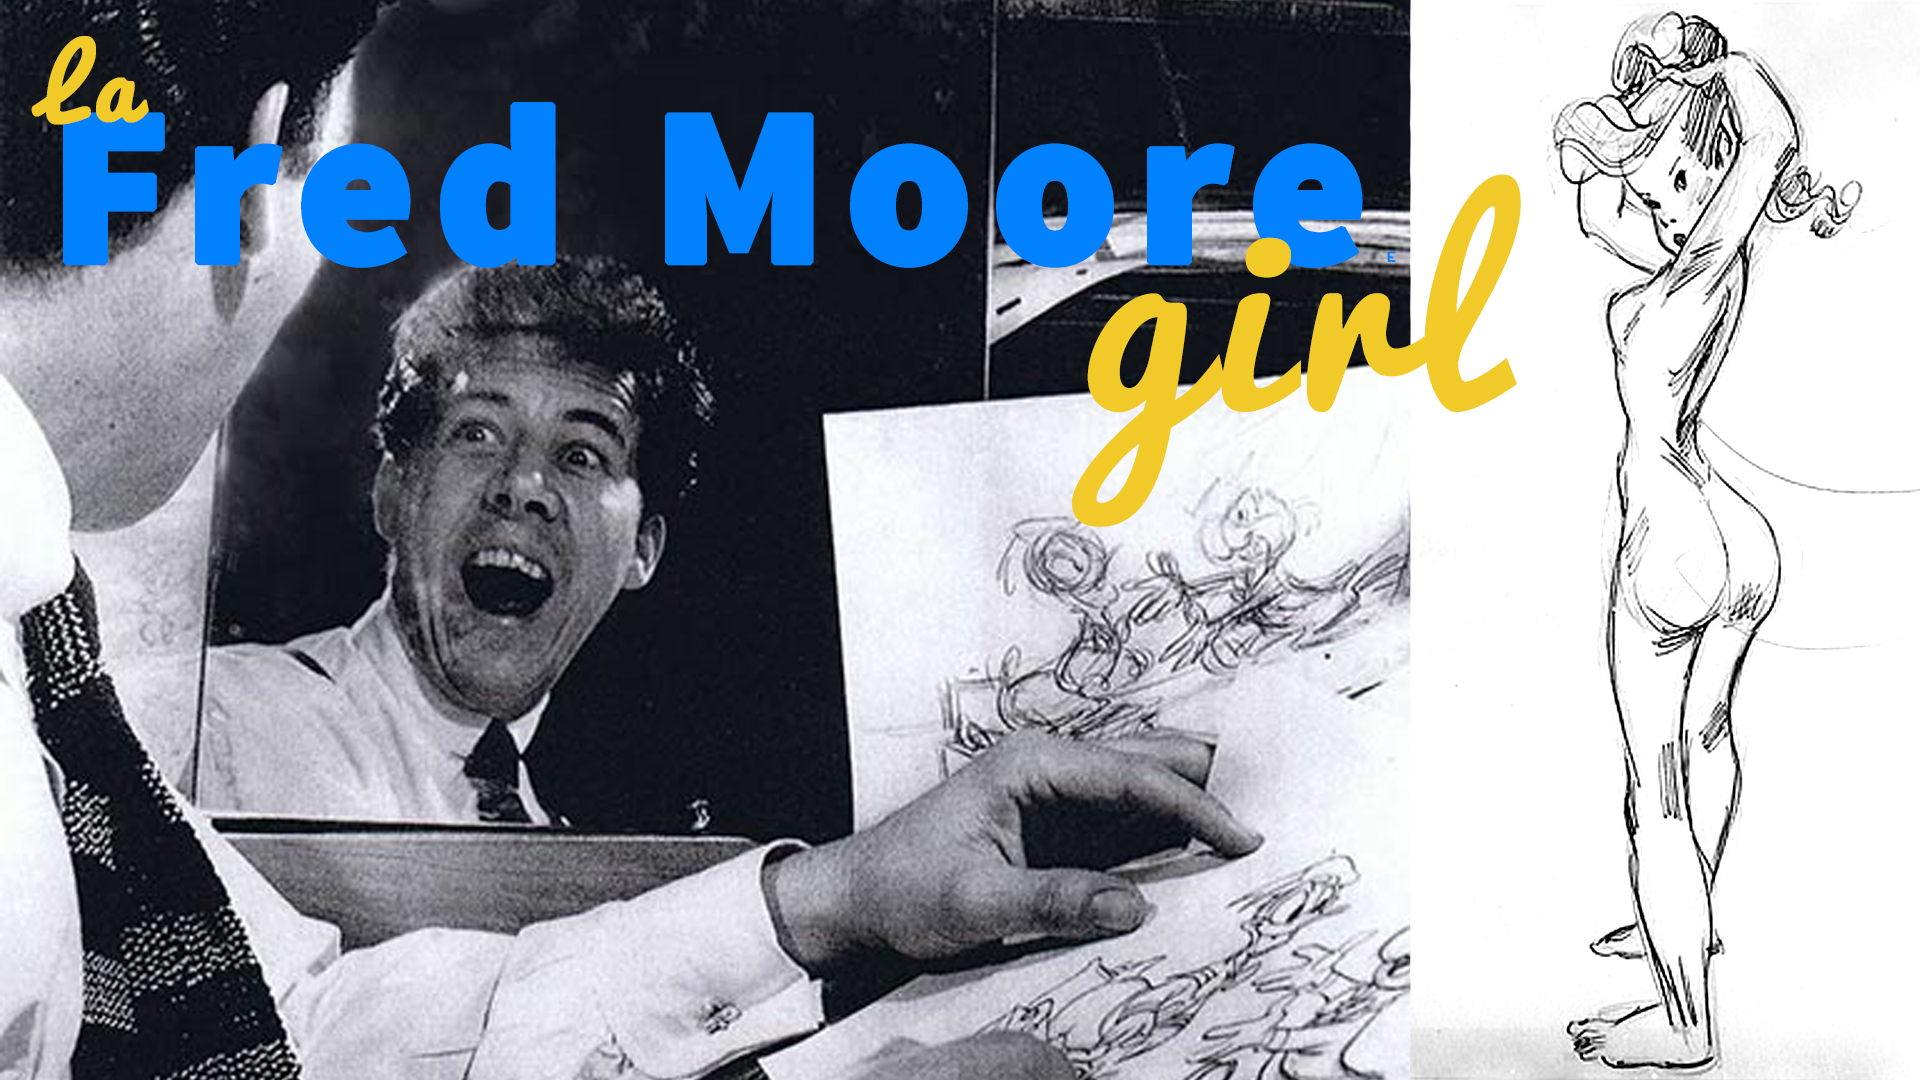 La Fred Moore Girl